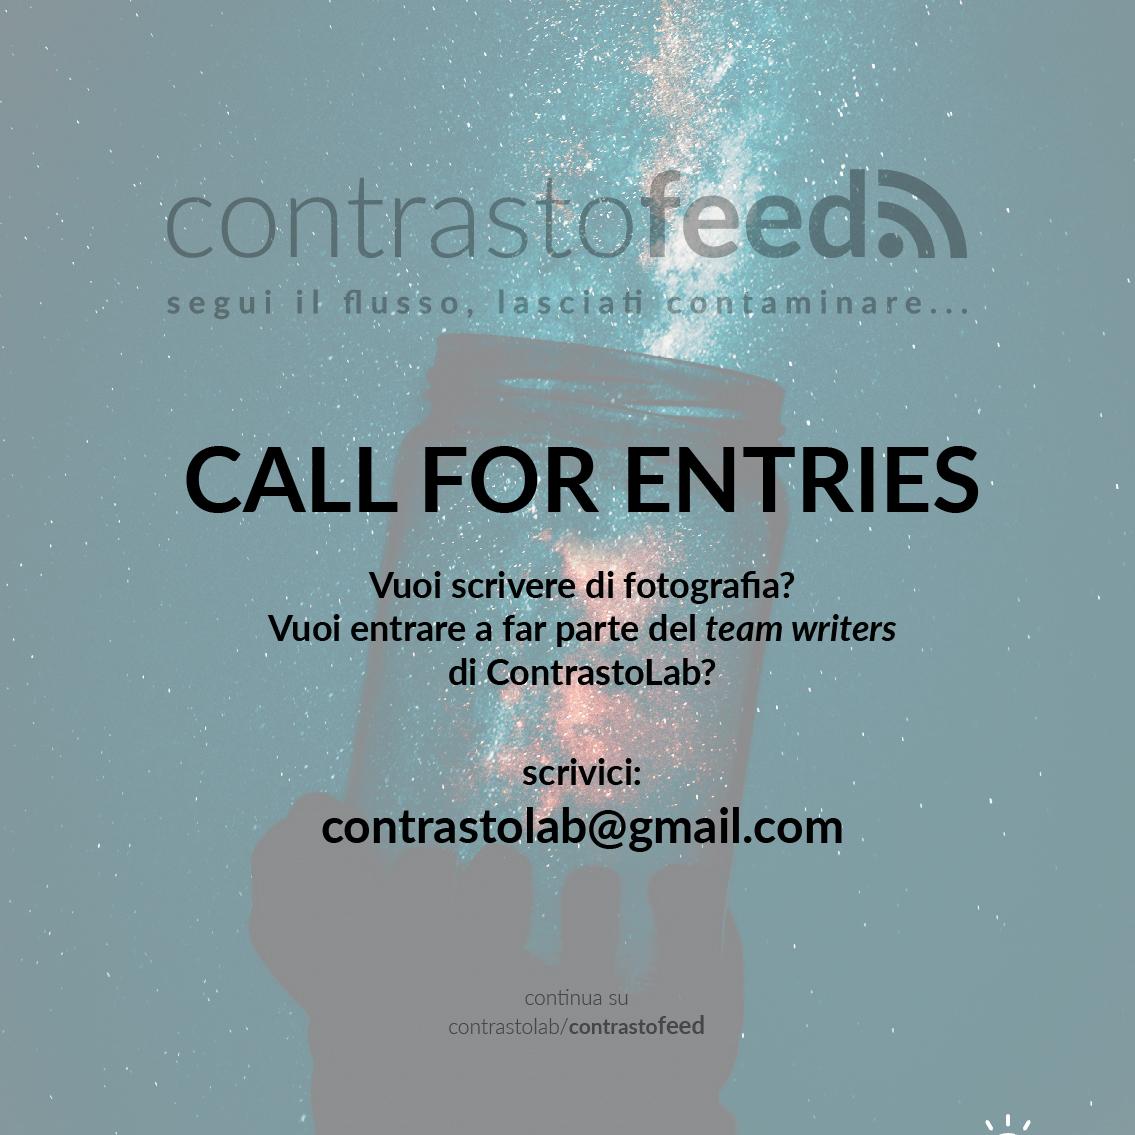 ContrastoFeed-02